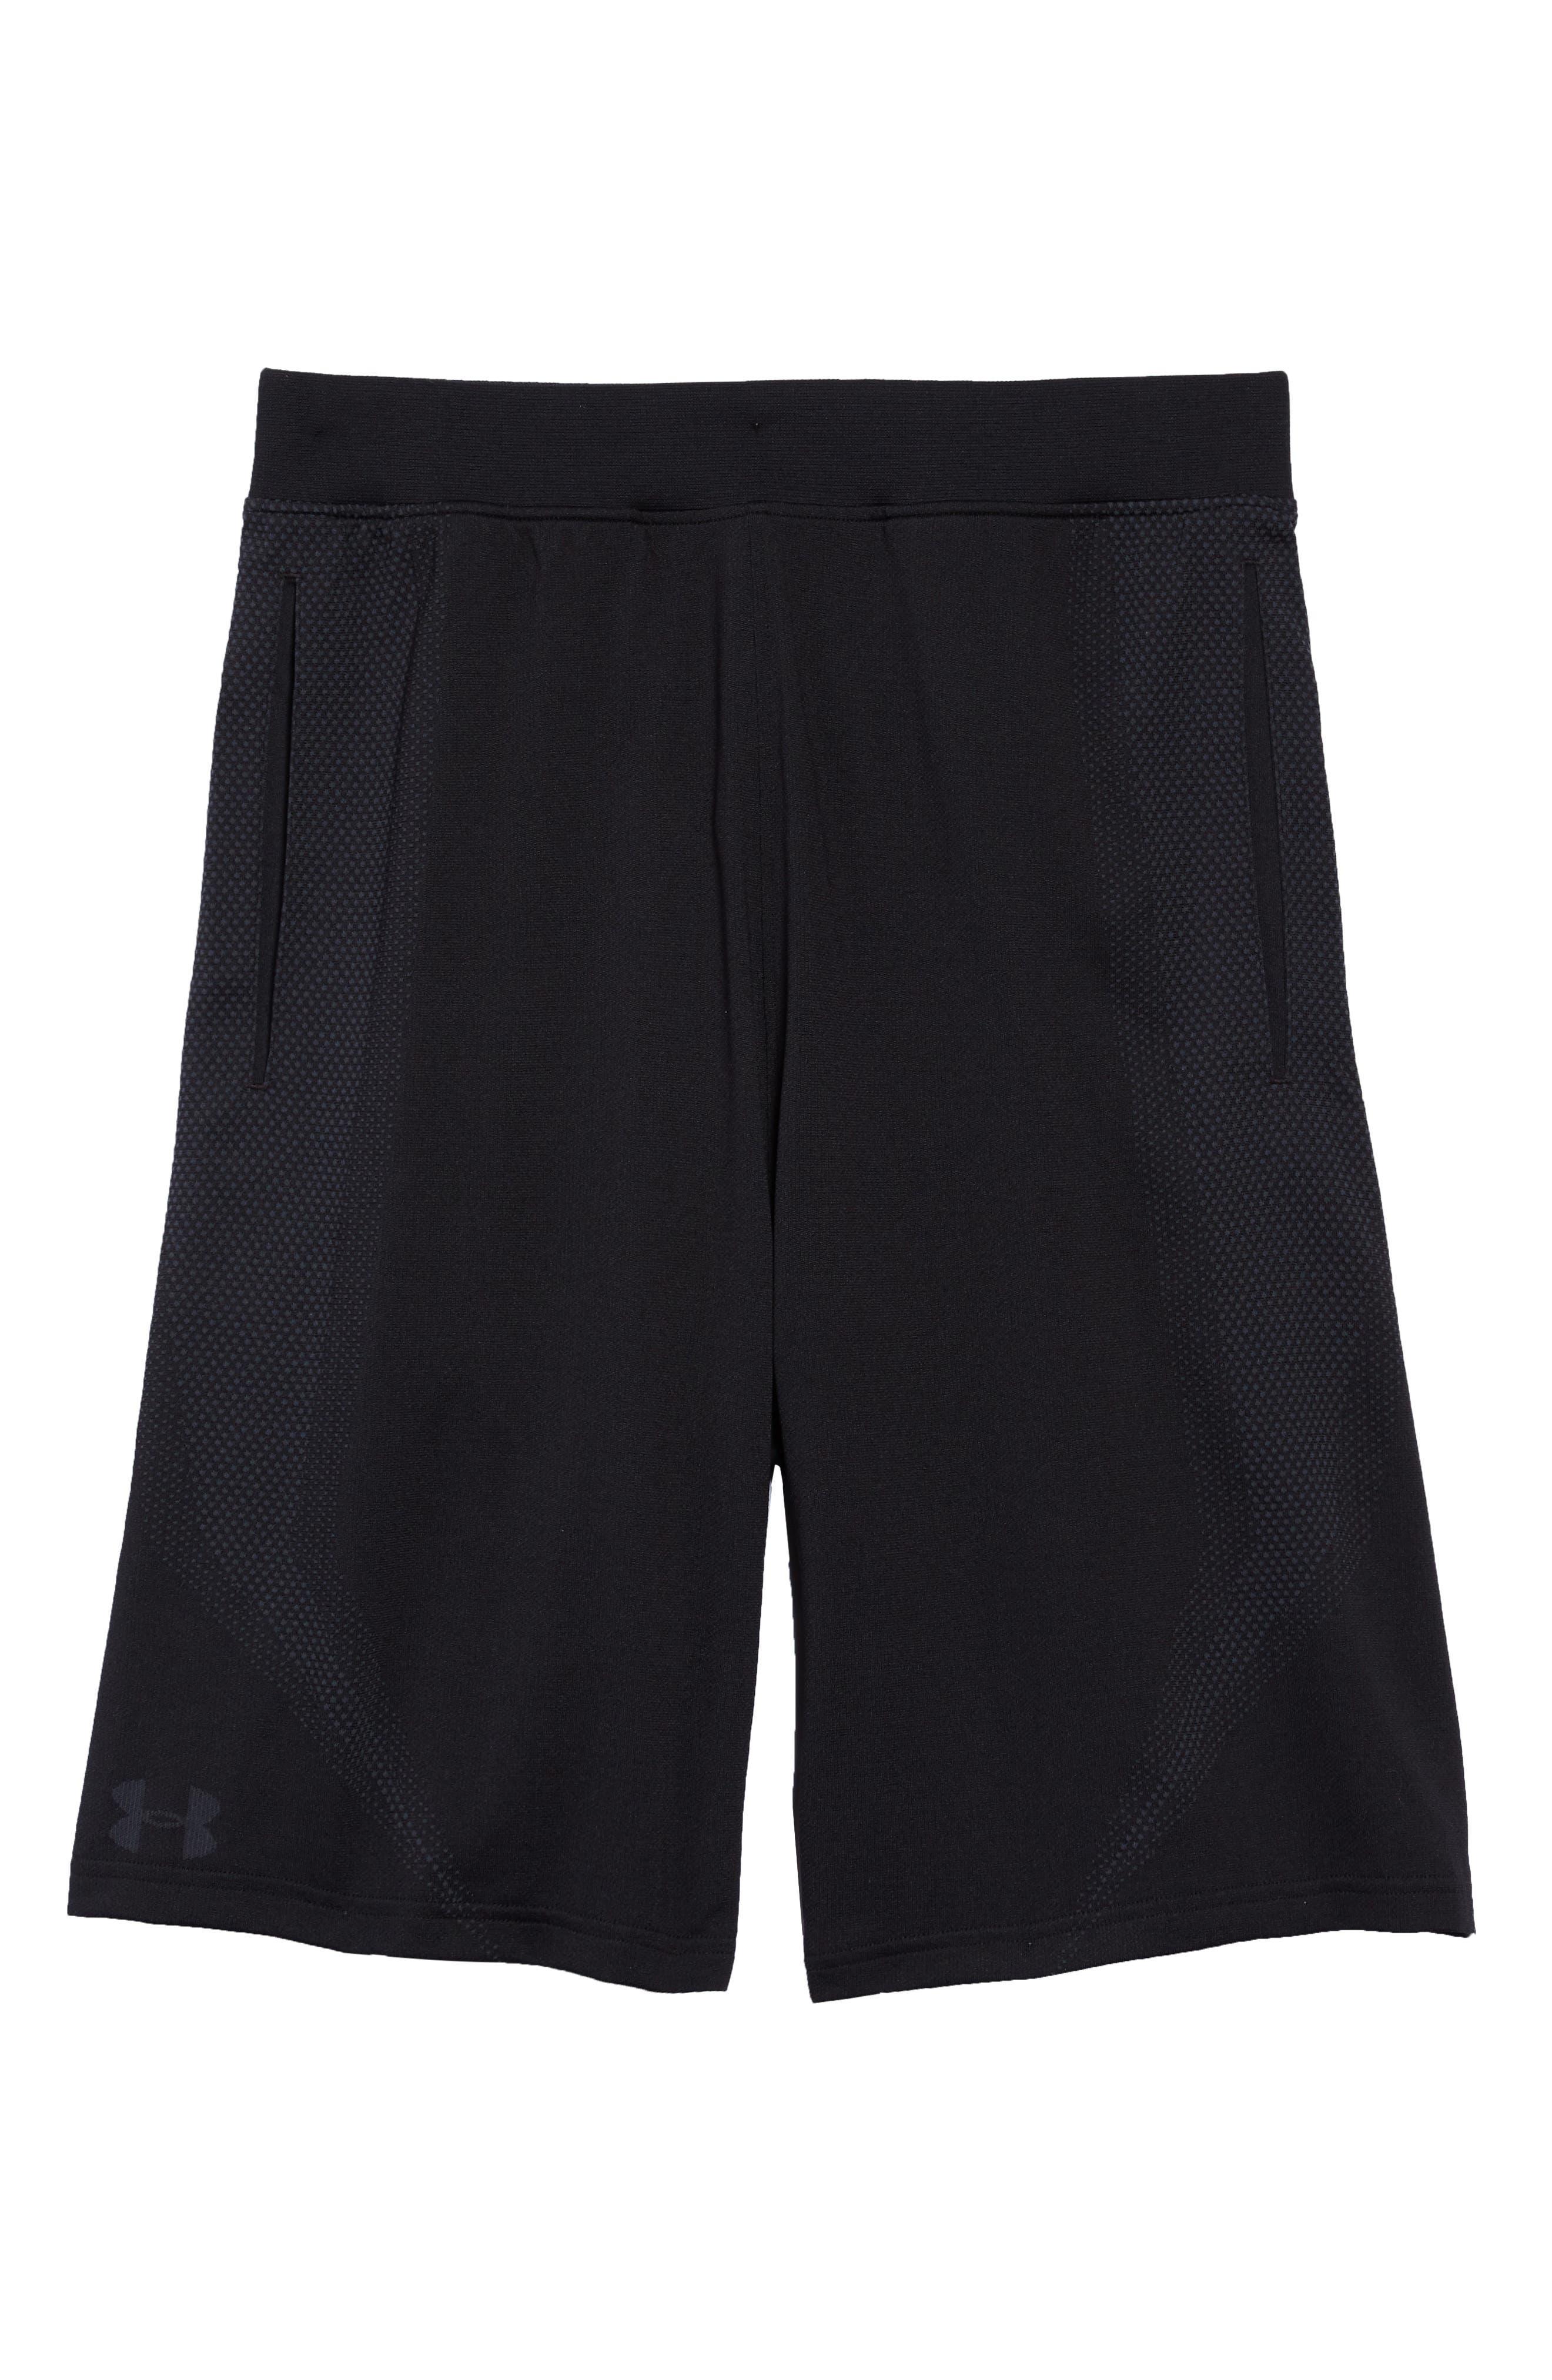 Threadborne Seamless Shorts,                             Alternate thumbnail 6, color,                             BLACK/ STEALTH GREH